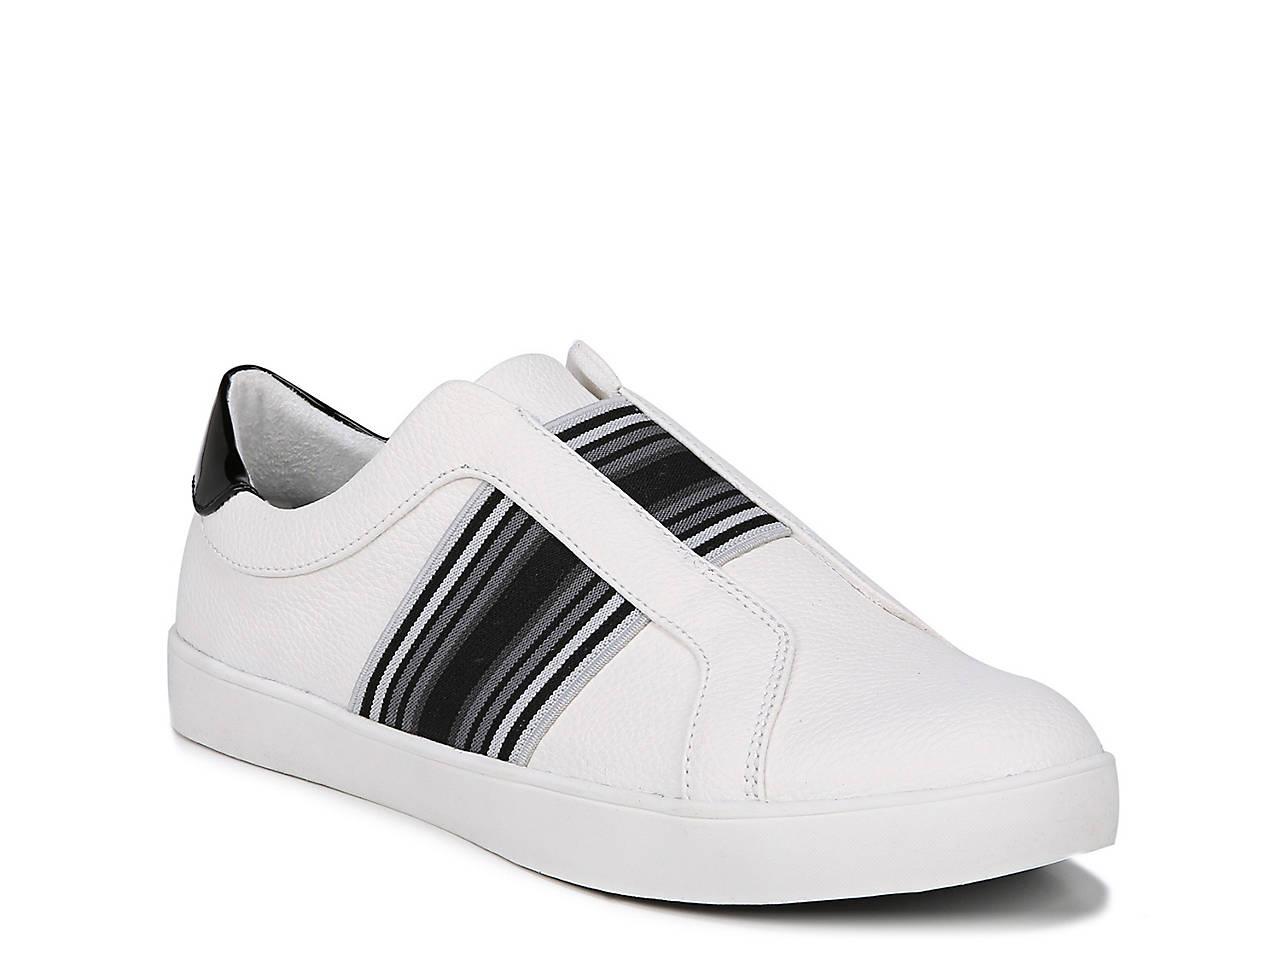 Dr. Scholl's Madi Band Women's ... Sneakers B3m8yU8